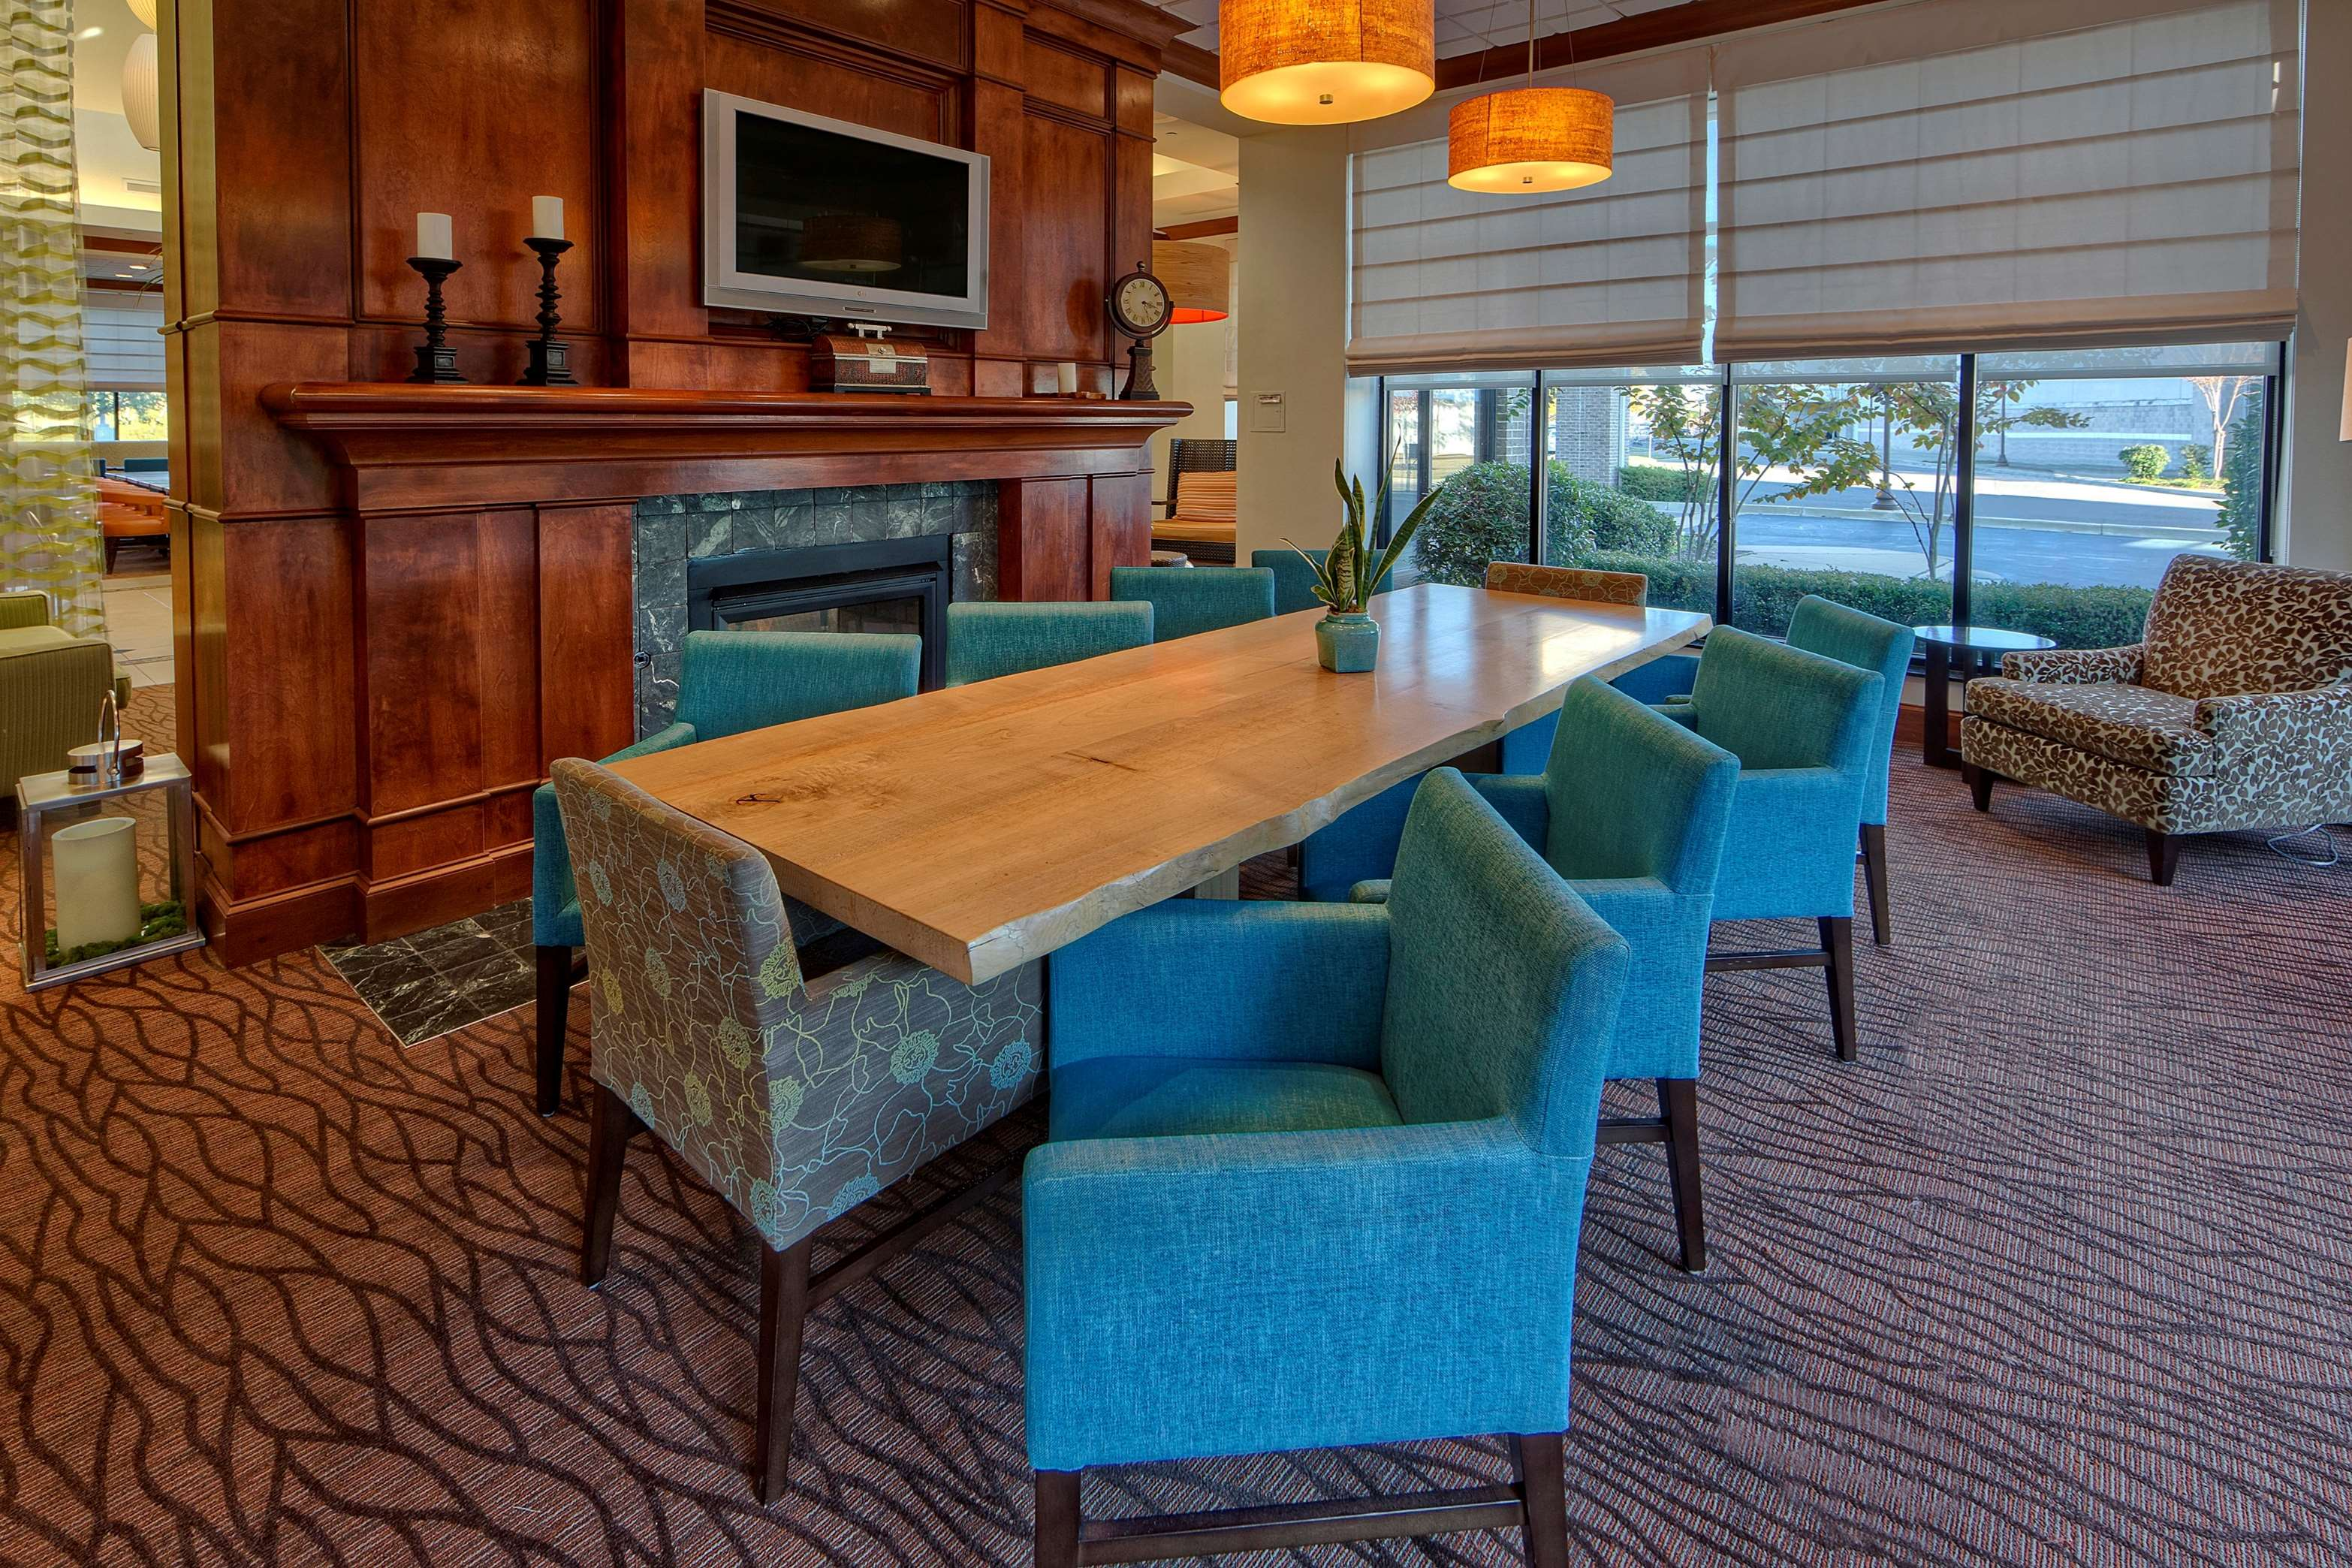 Hilton Garden Inn Memphis/Southaven, MS image 11